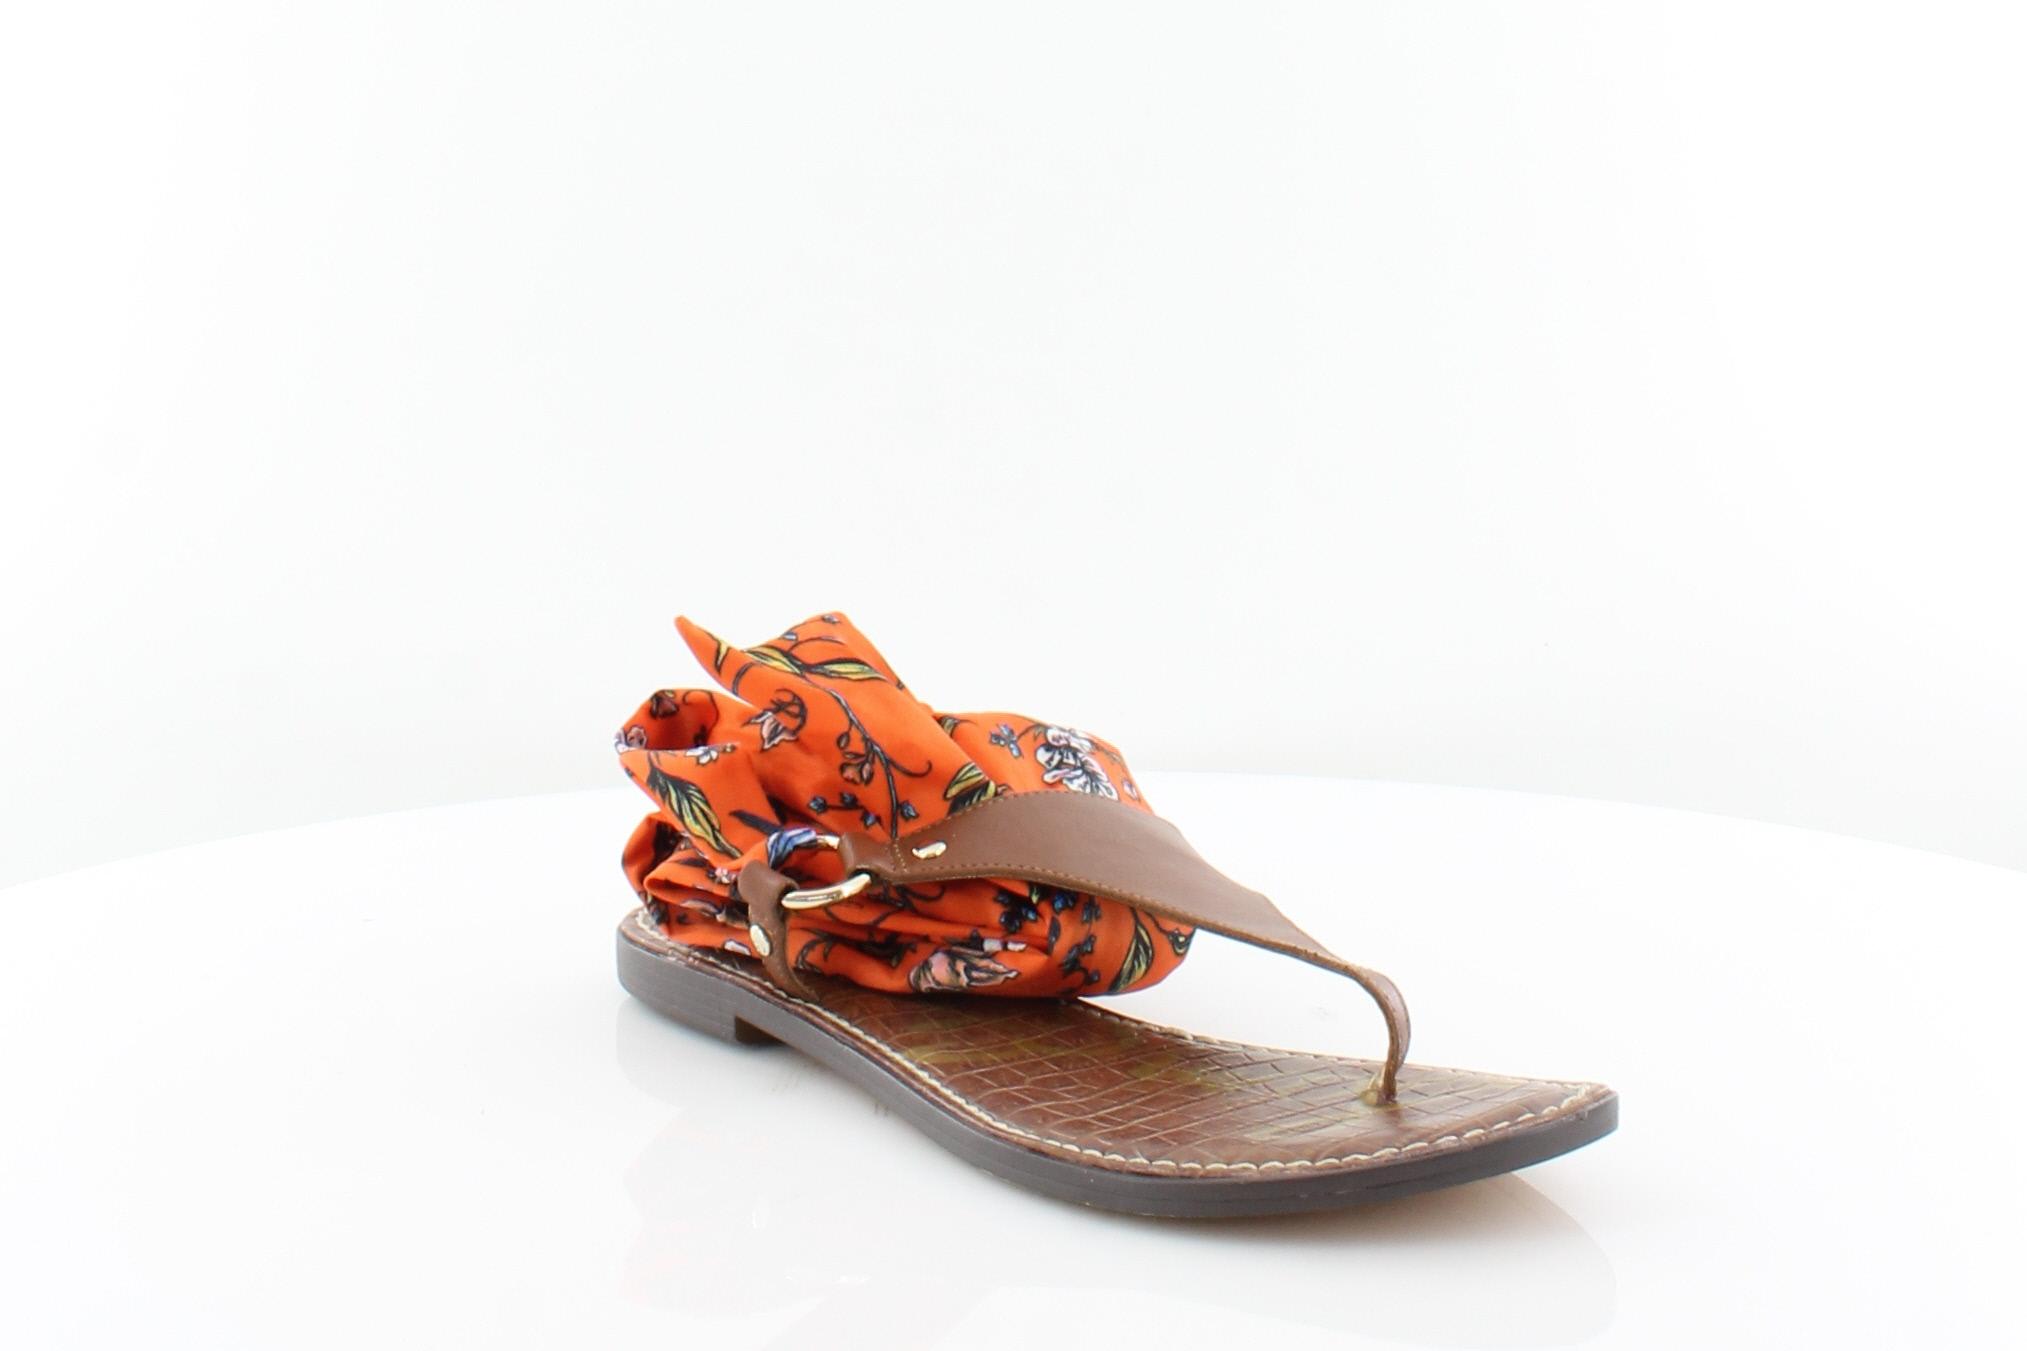 20959eee0d2 Sam Edelman Giliana Orange Womens Shoes Size 7.5 M Sandals MSRP  90 ...